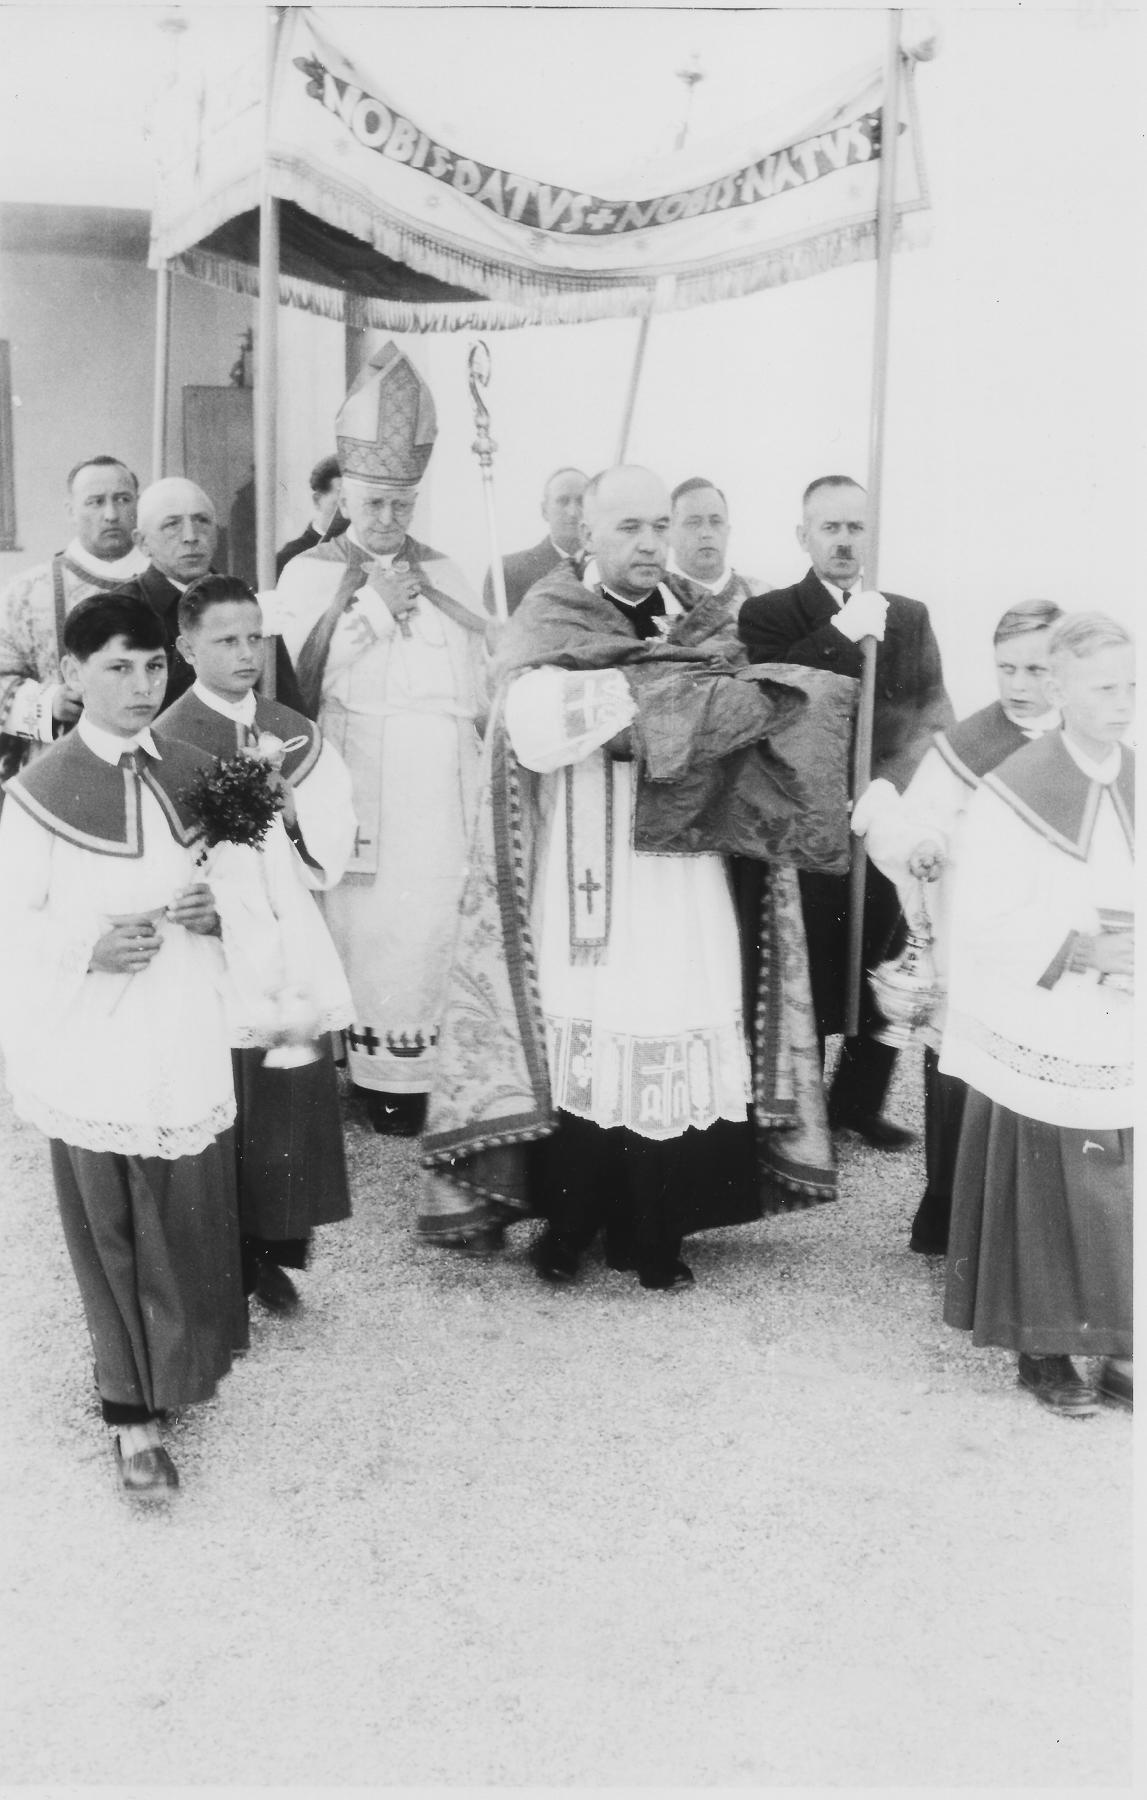 1957_27_04_Weihe_HJK_Dr. Joseph_Freundorfer